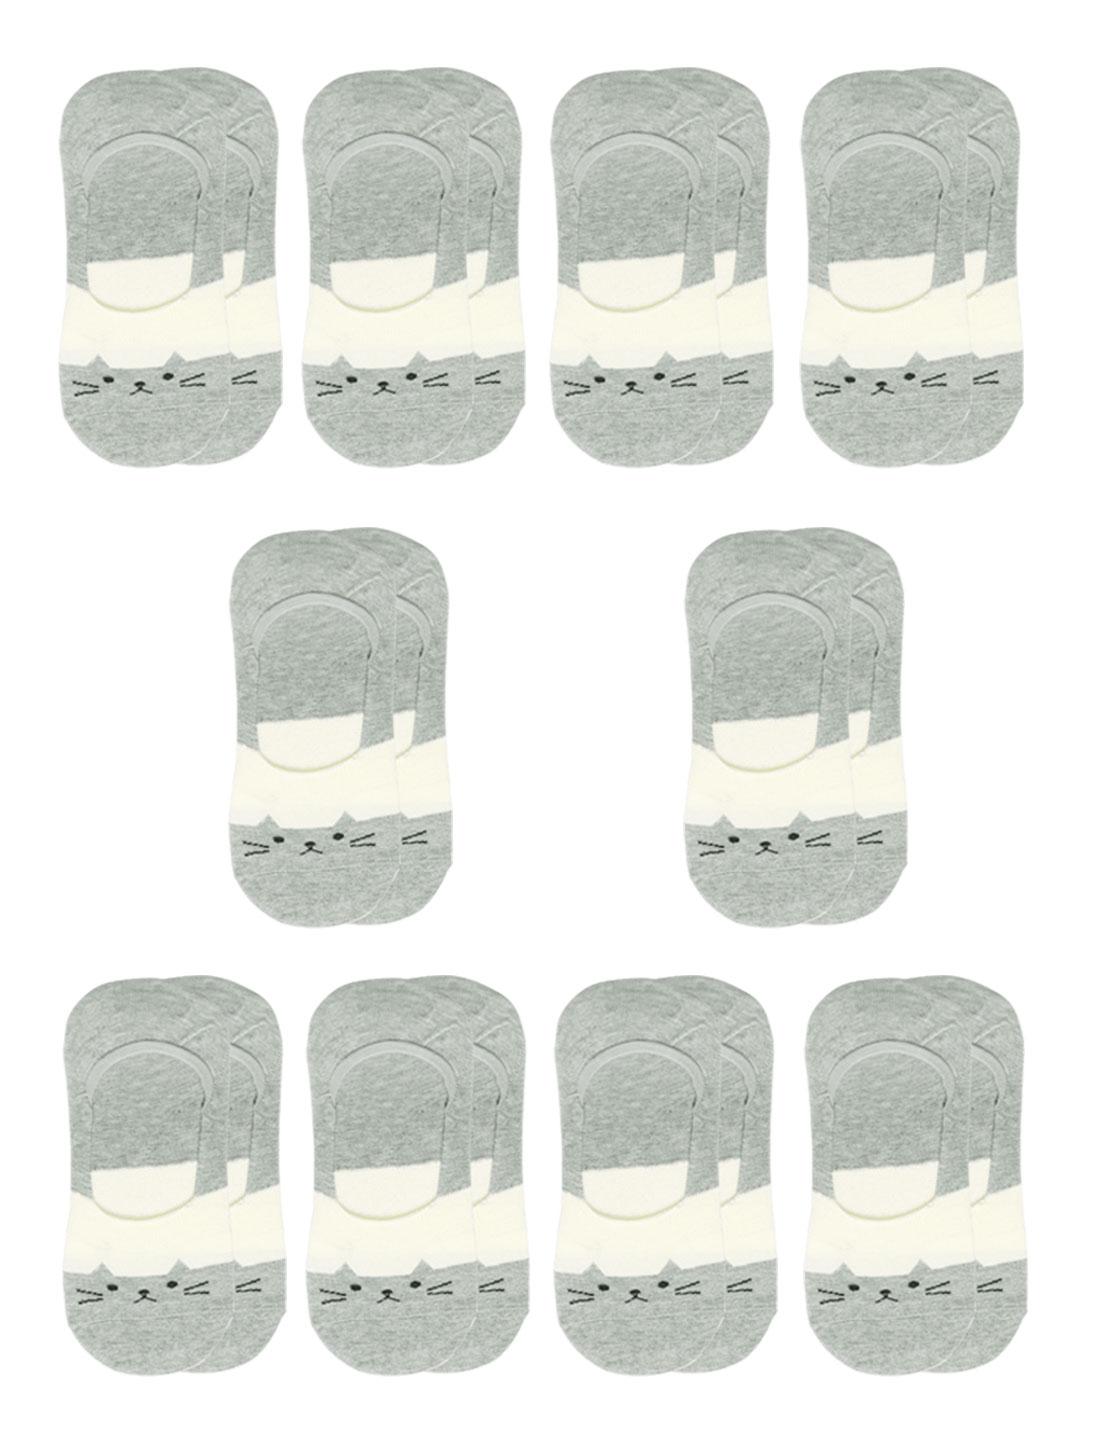 Women Cat Pattern Low Cut Elastic Cuffs Boat Socks 10 Pairs Gray 7-9